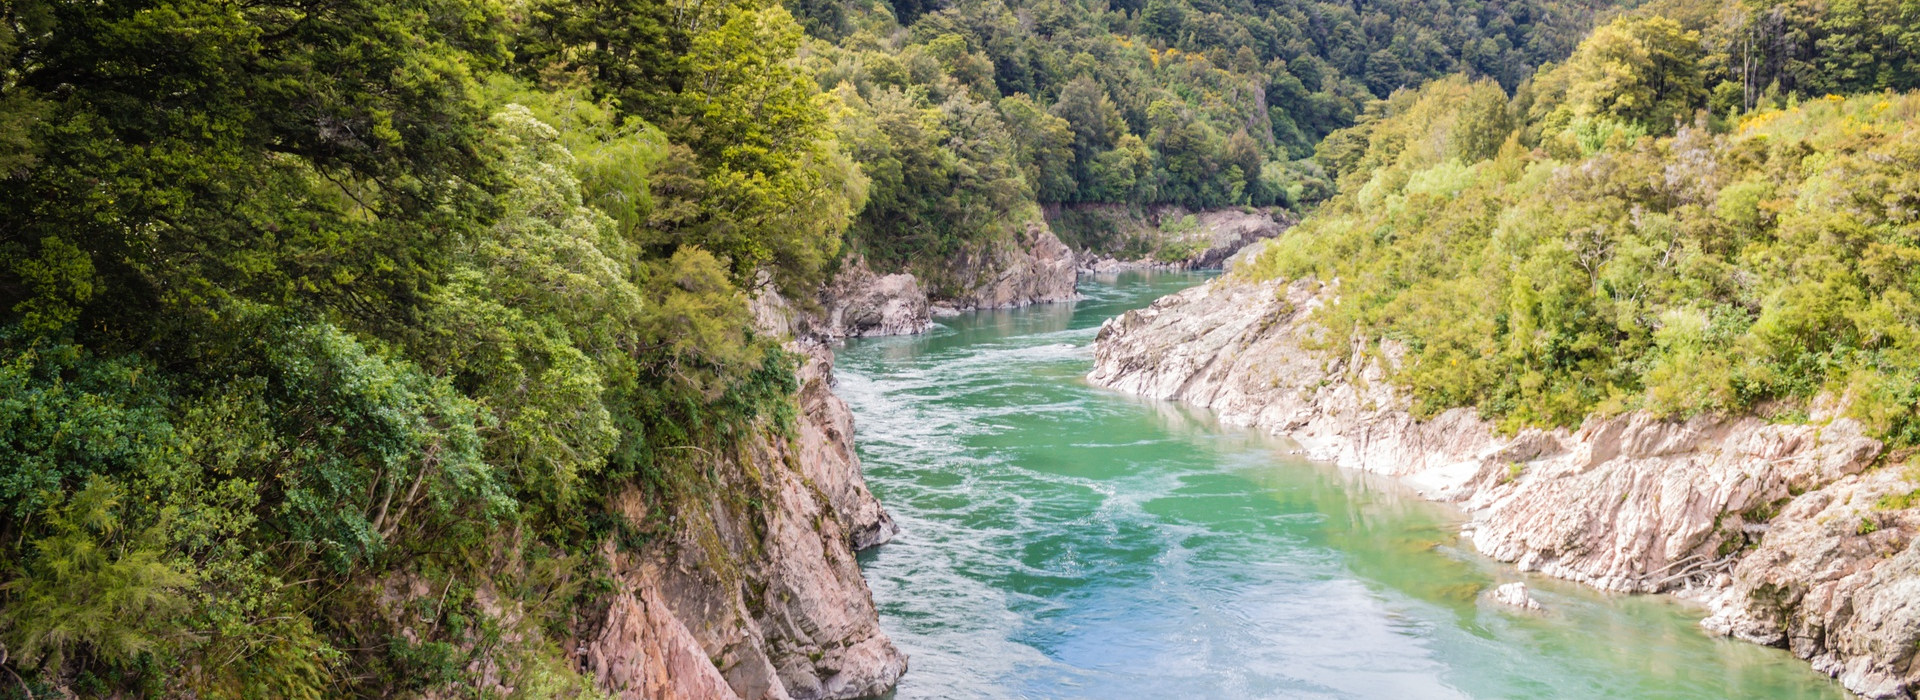 Buller River, New Zealand @TripBucket